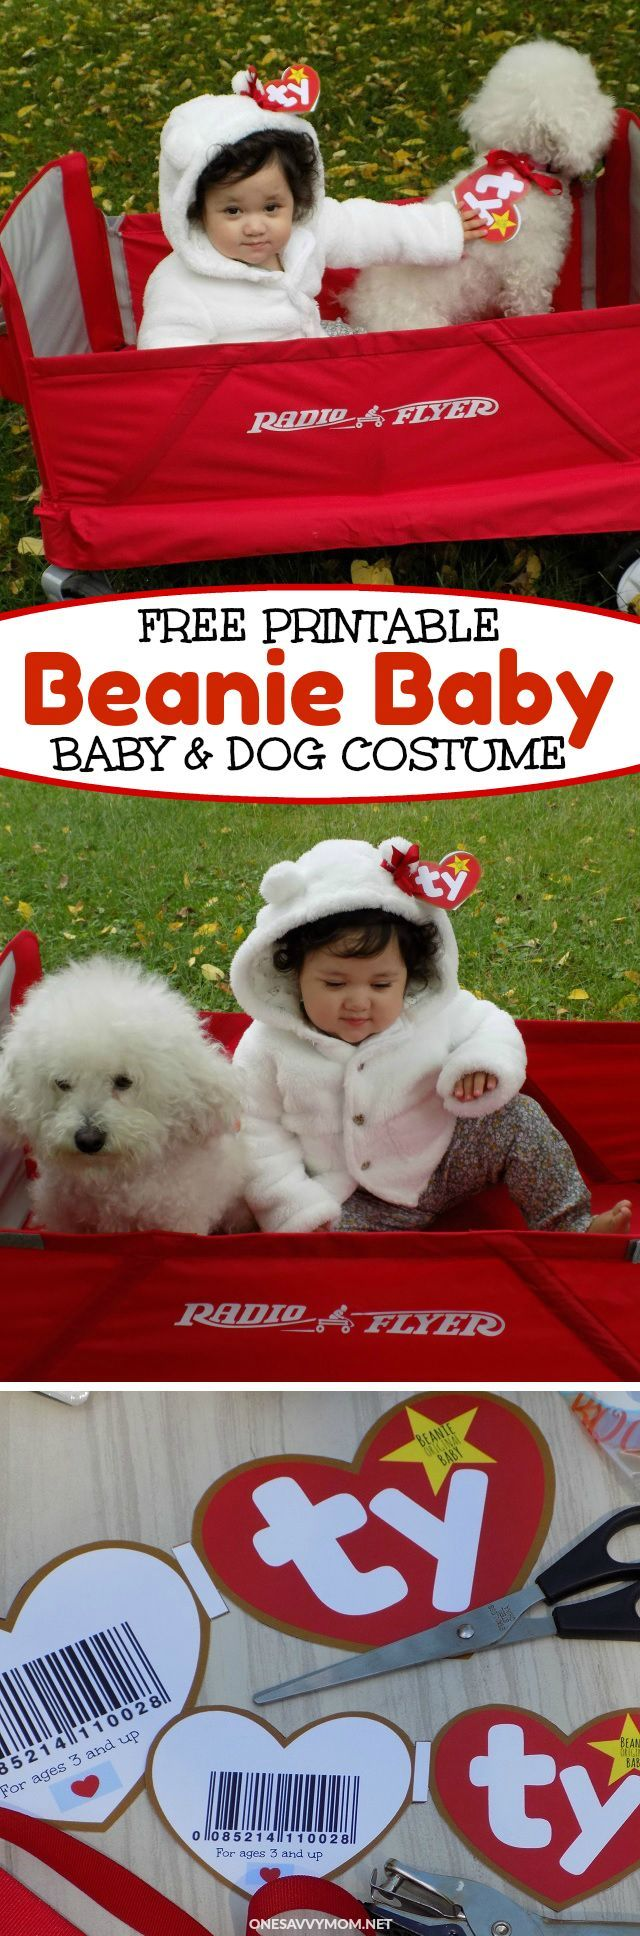 DIY Beanie Baby Halloween Costume For Babies & Dogs - Grab My Super Cute Free Printable! #GigglesandWiggles #ad